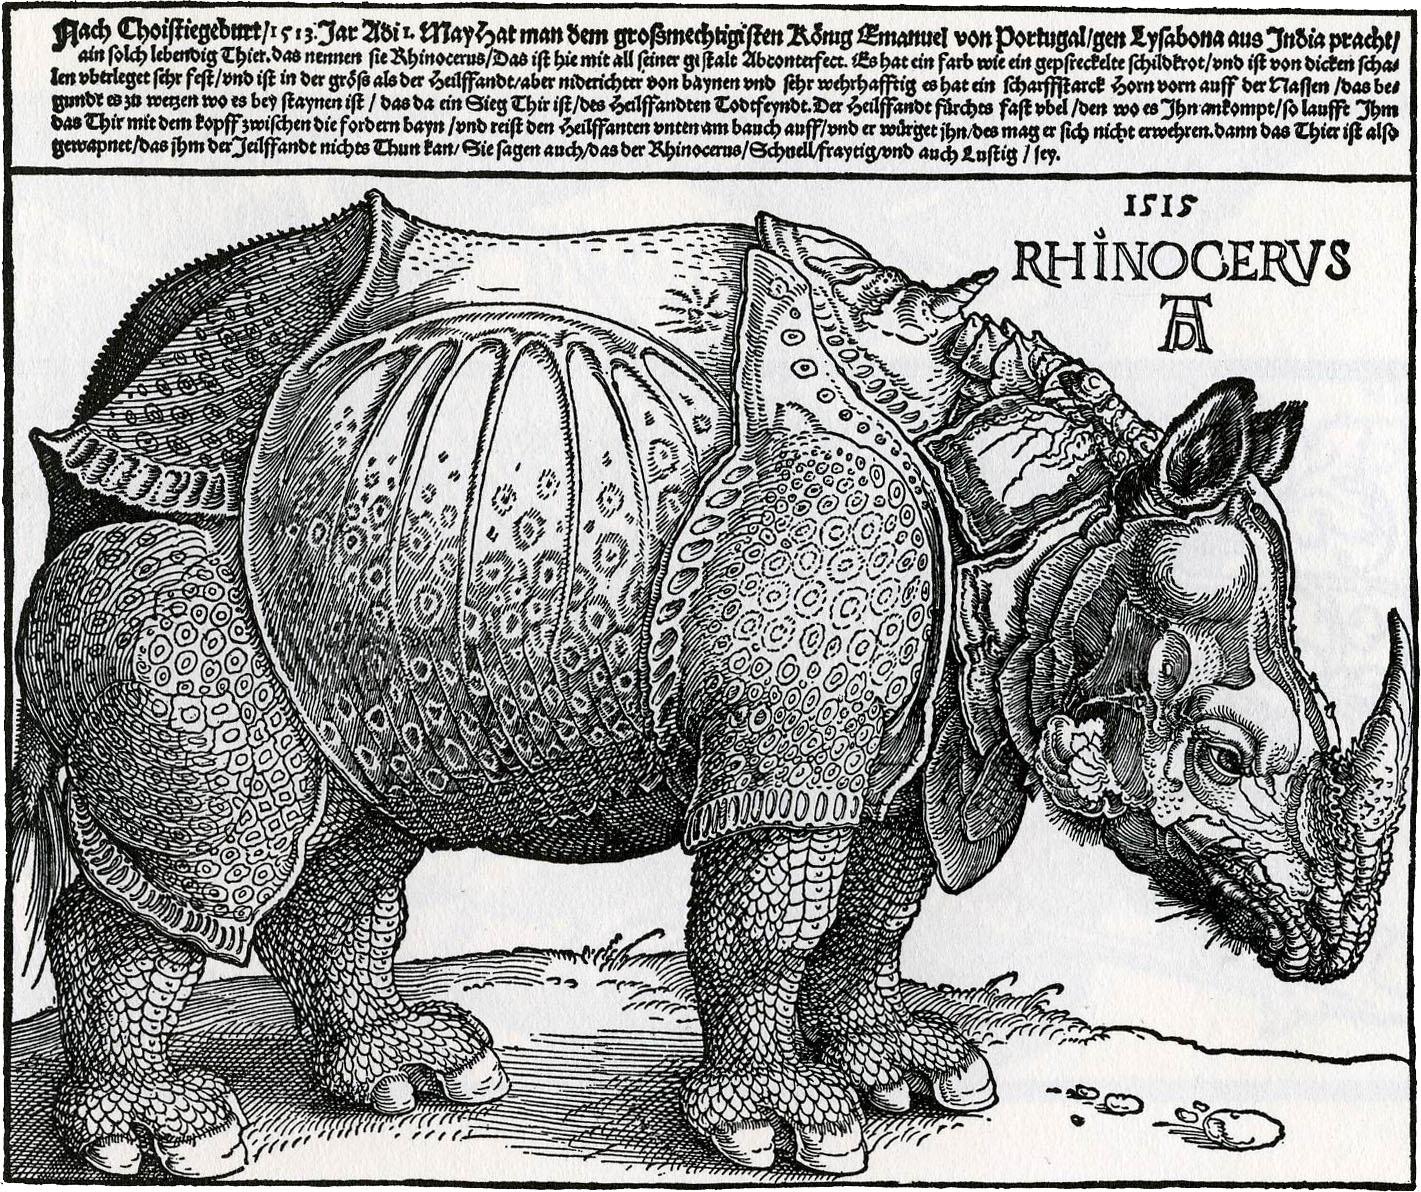 http://4.bp.blogspot.com/-VZAGNbgKV3I/T-vpx3zcMnI/AAAAAAAAAcI/rNC3542e4zo/s1600/durer-rhinoceros-engraving-1515.jpg